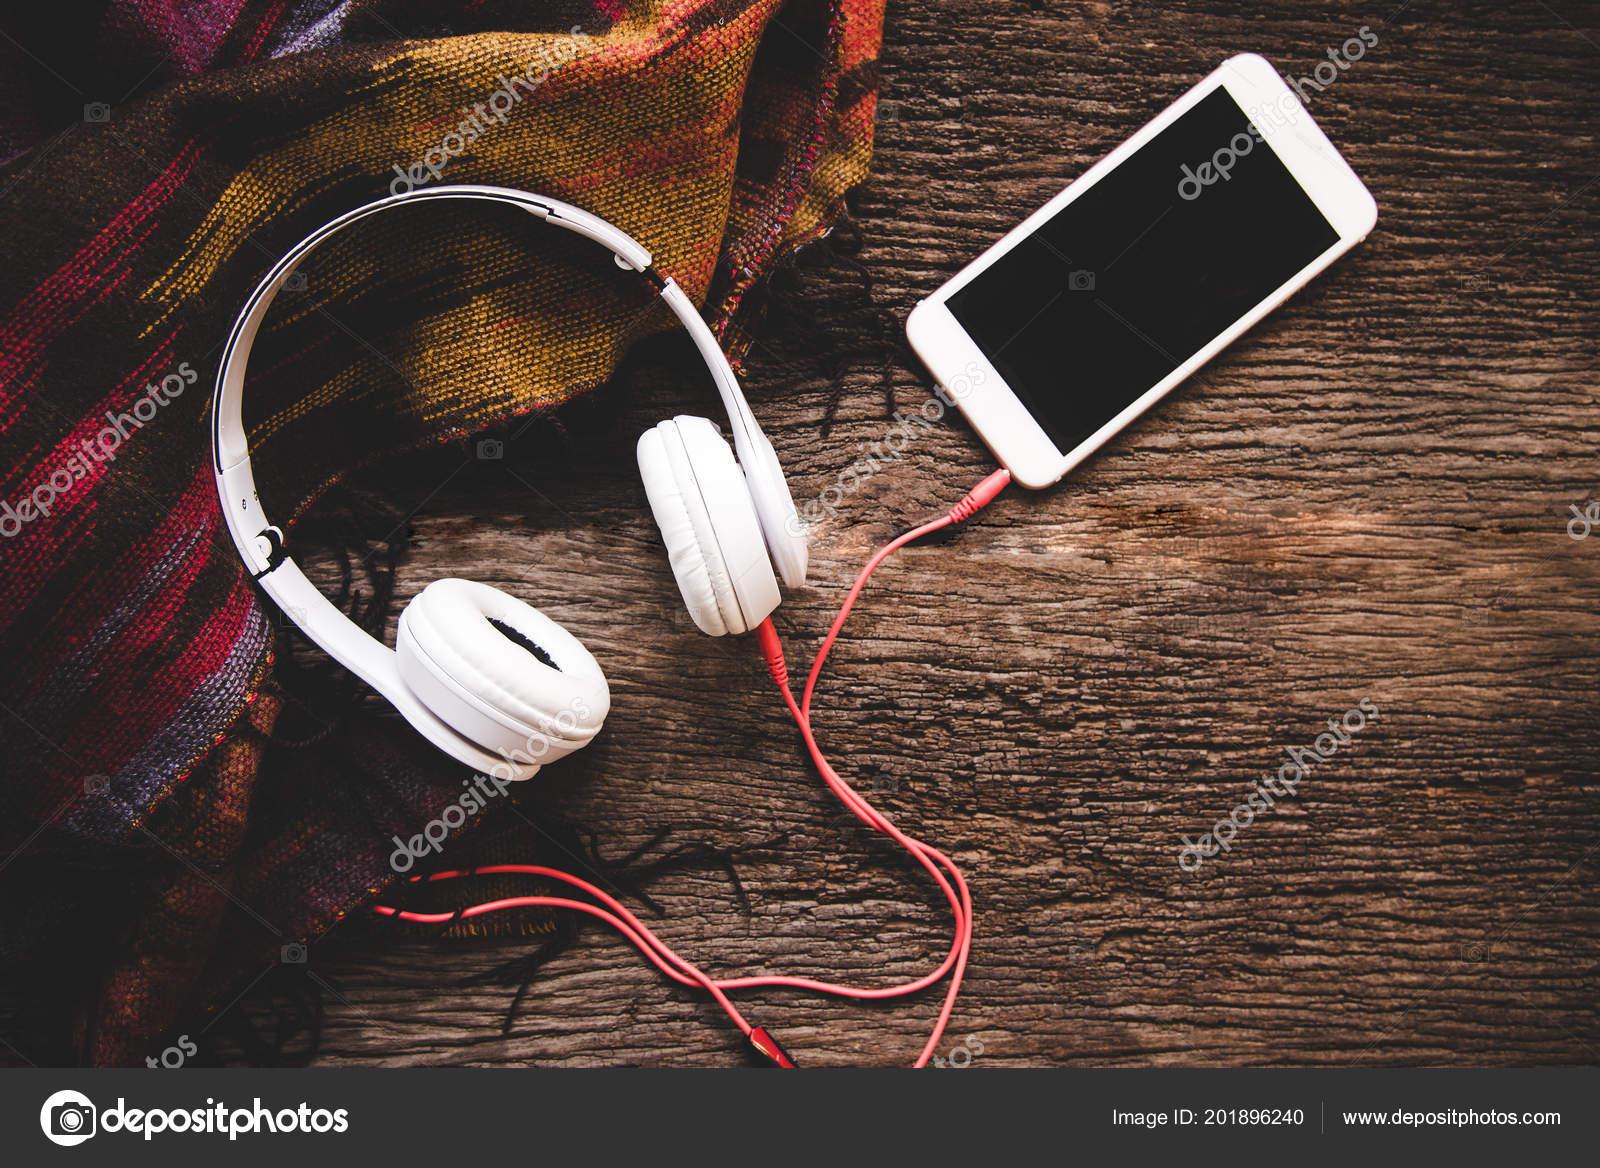 938ef3edf81e Άνετο Χειμώνα Παρασκήνιο Ζεστό Φλιτζάνι Καφέ Marshmallow Και Ακουστικών  Μουσική– εικόνα αρχείου